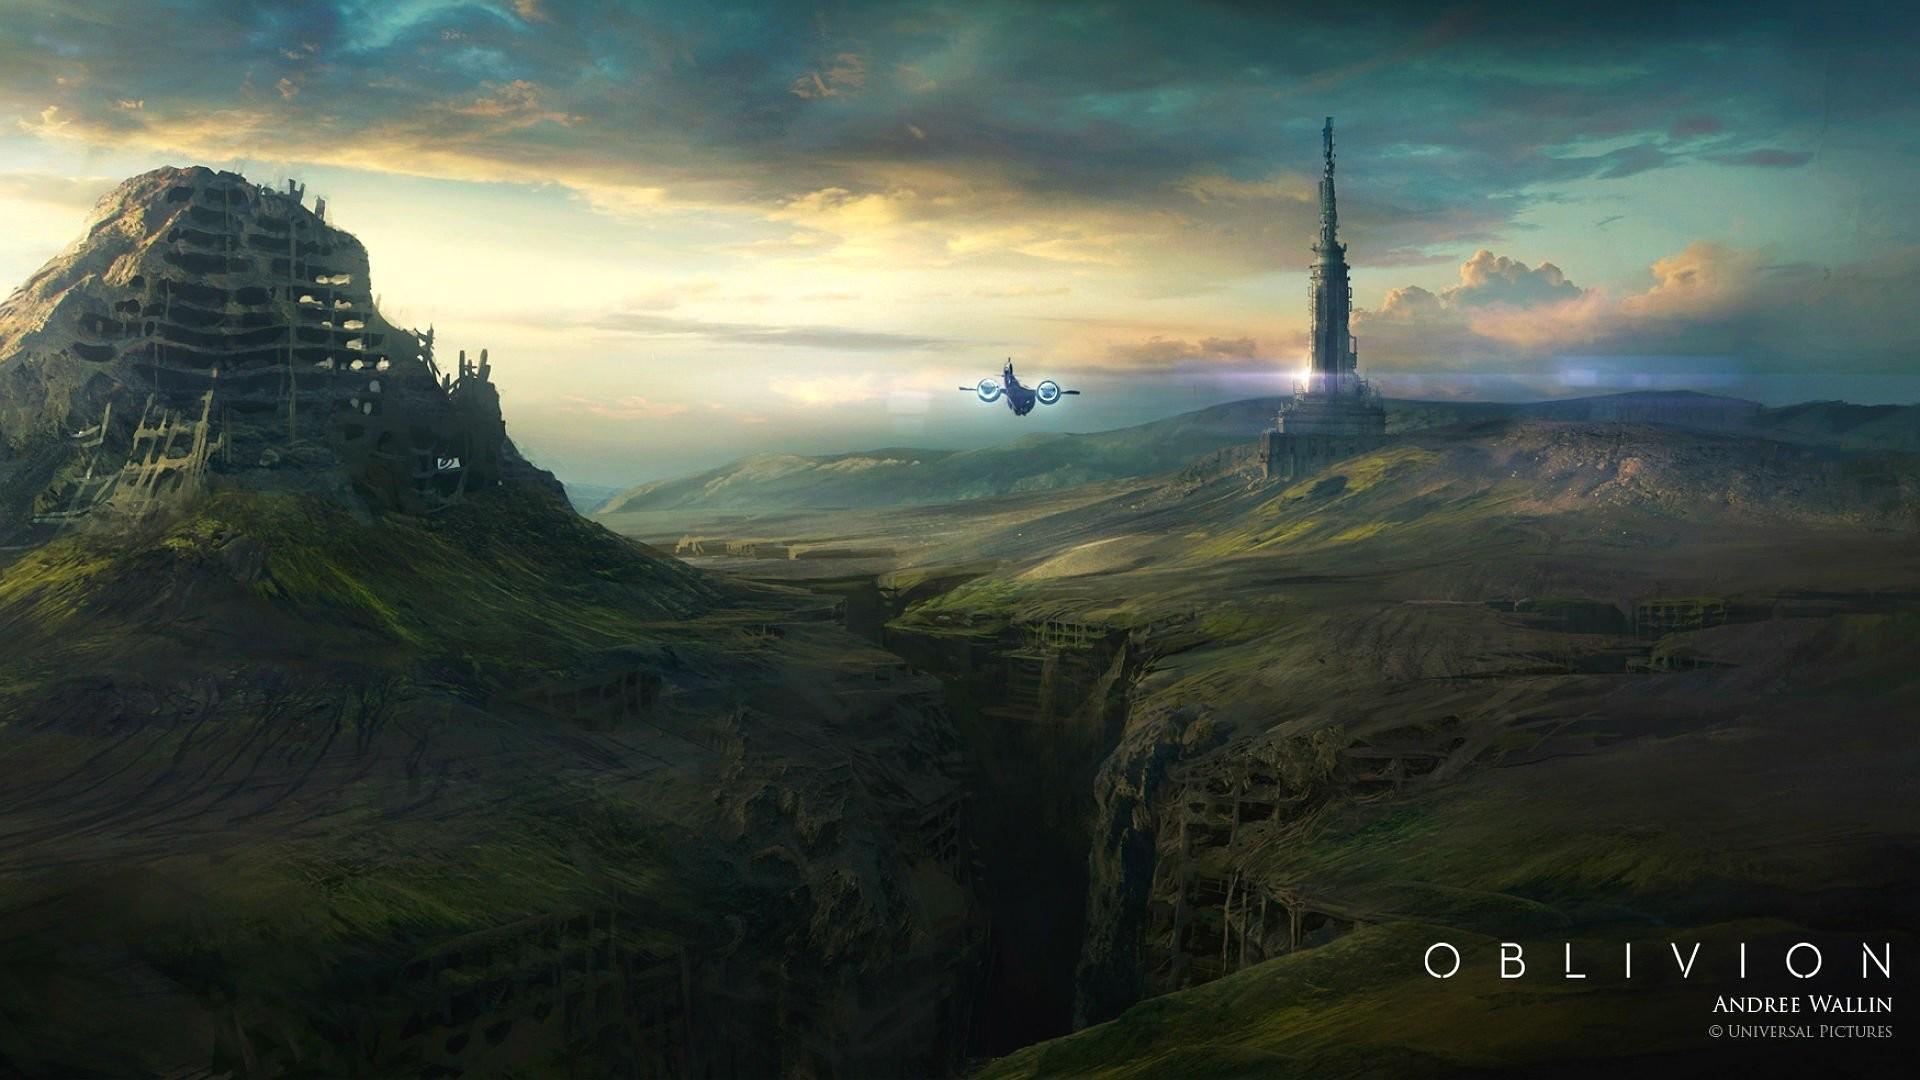 Download Oblivion Wallpaper Hd Backgrounds Download Itl Cat